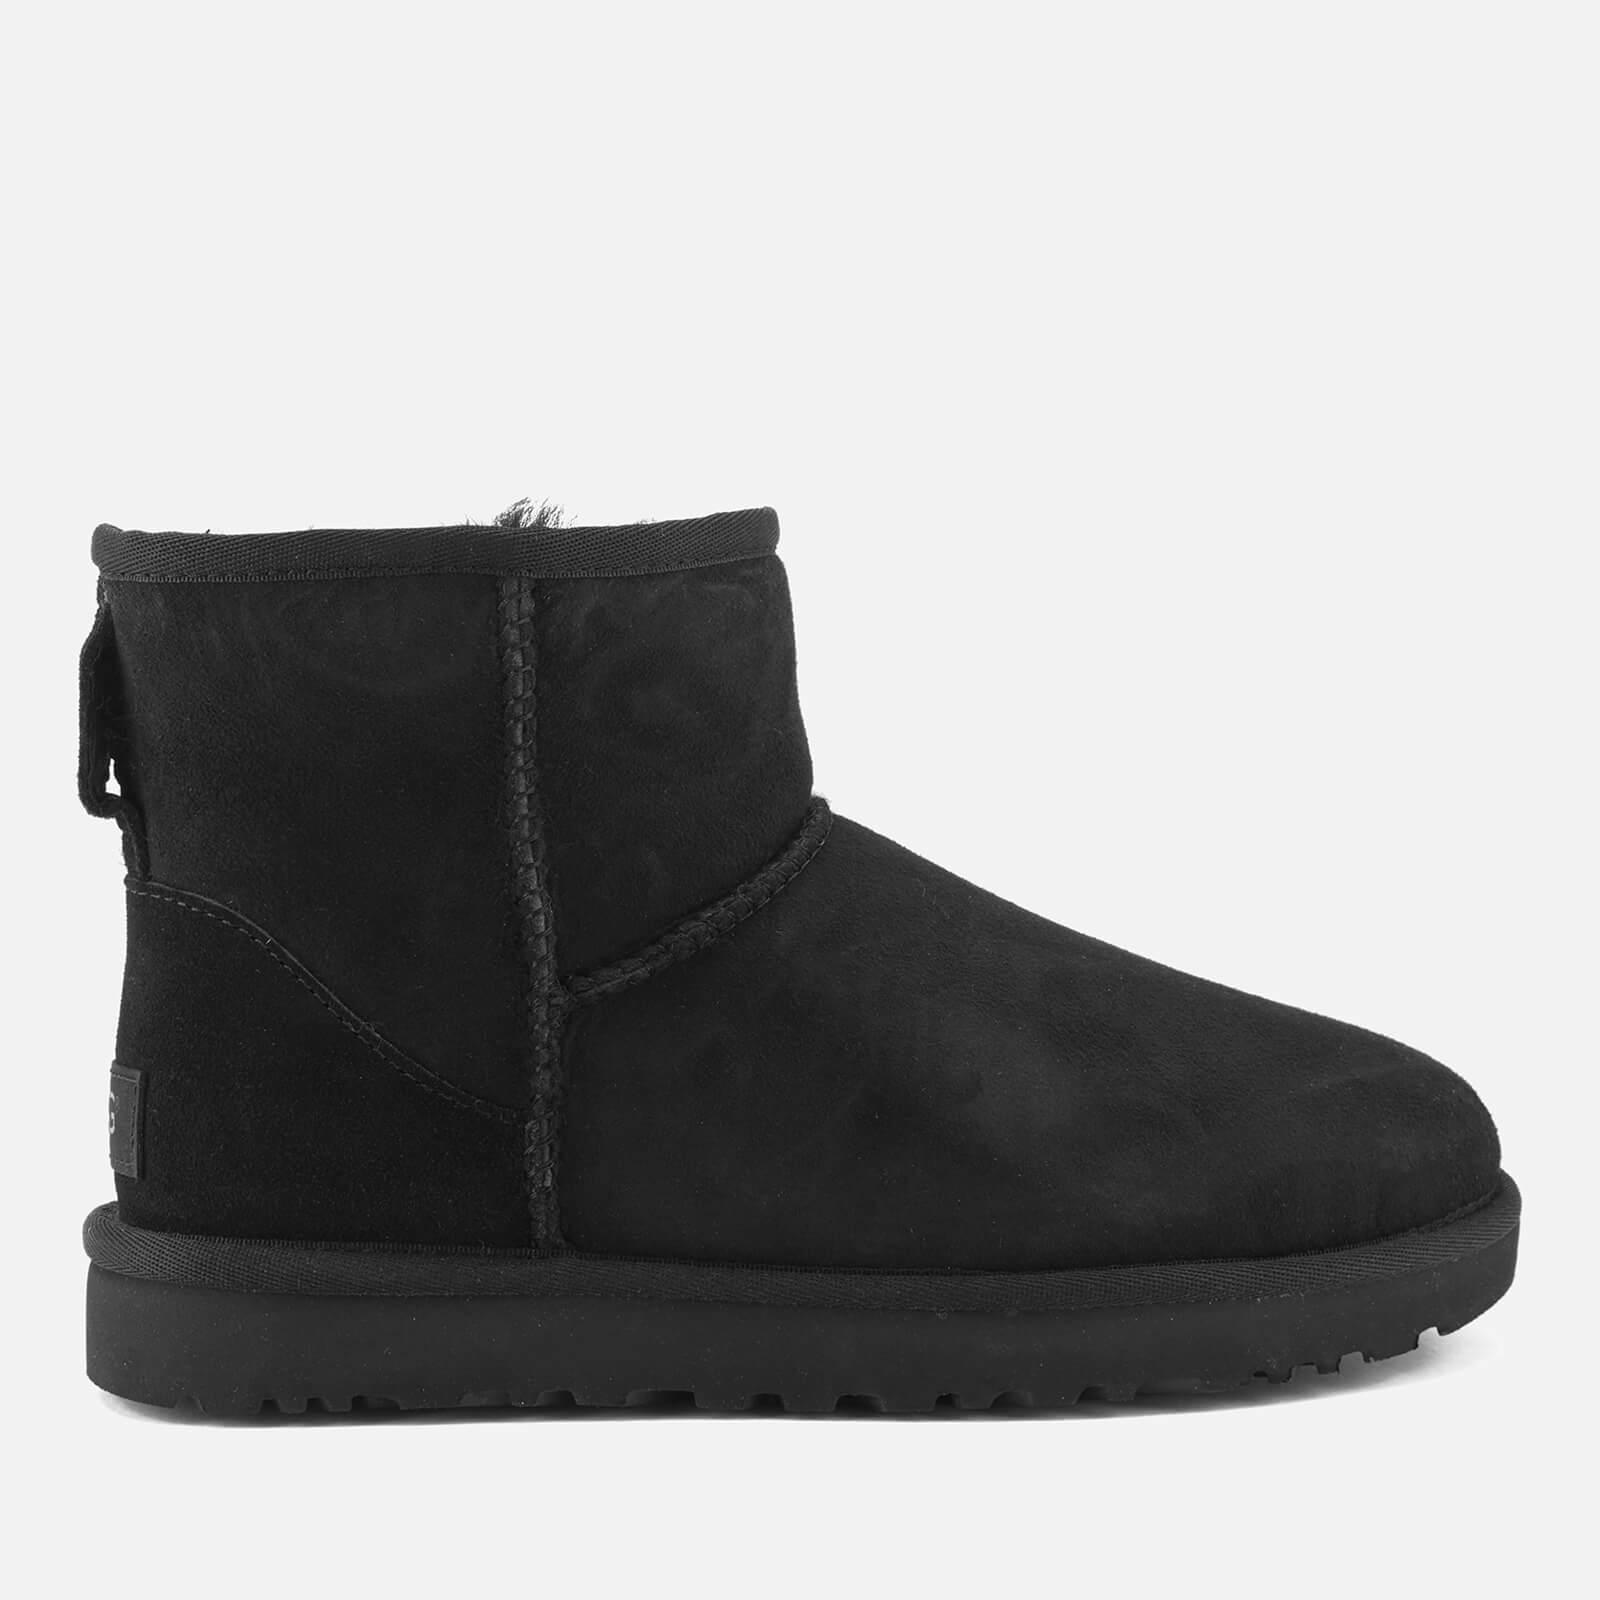 UGG Women's Classic Mini II Sheepskin Boots - Black - UK 8